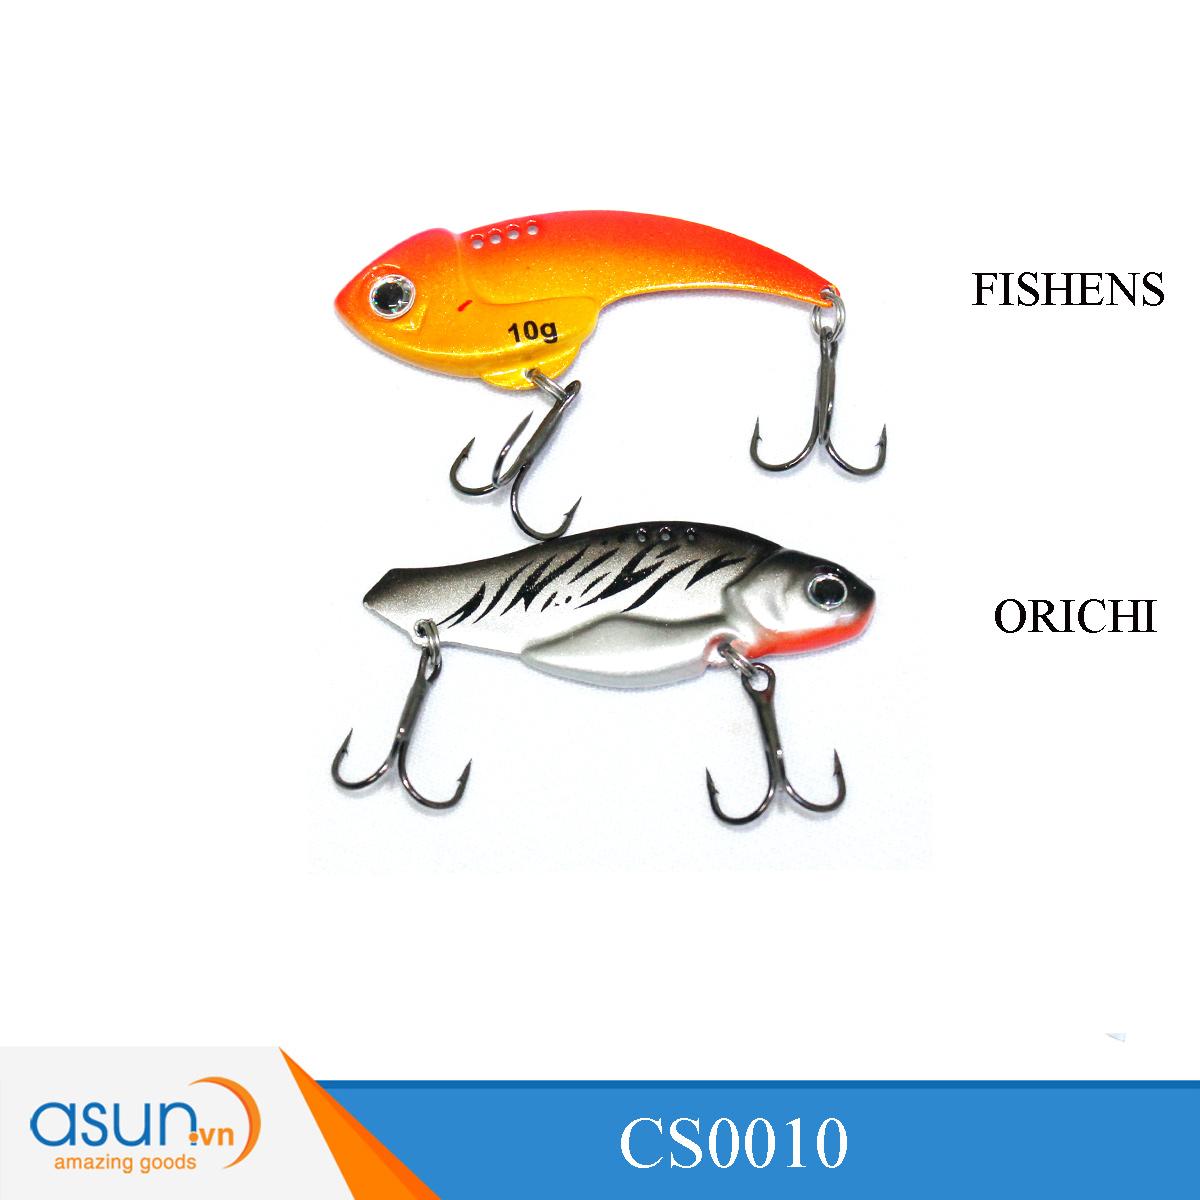 Mồi Câu Cá Giả - Cá Sắt Fishens - Orichi - Mồi Thìa Câu Lure Lóc 10g